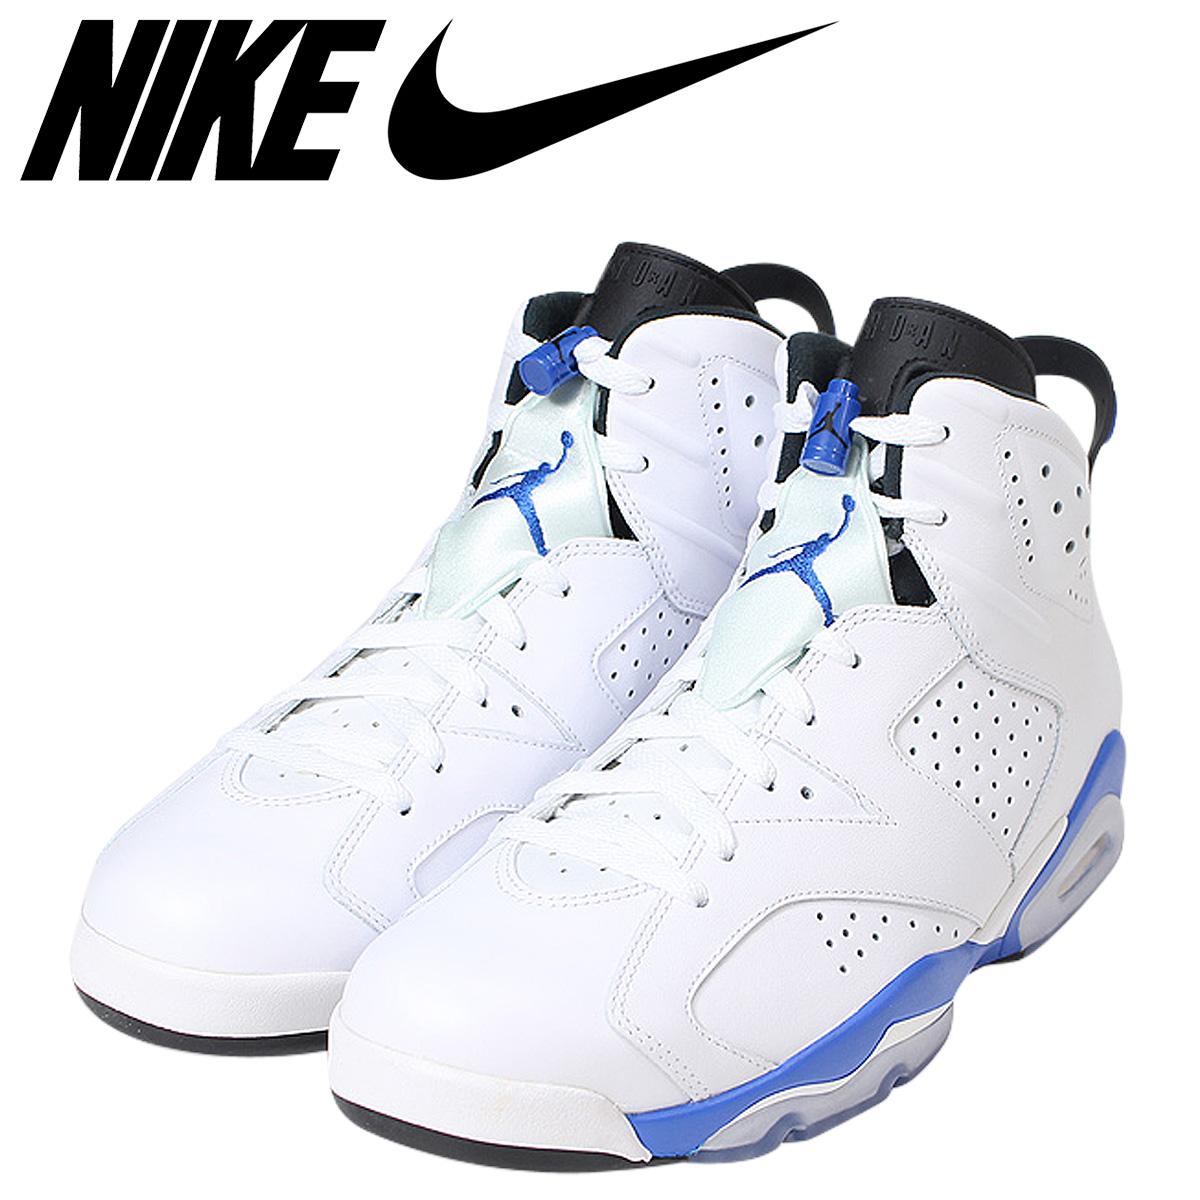 separation shoes 78676 35fc8 Nike NIKE Air Jordan 6 nostalgic sneakers AIR JORDAN 6 RETRO SPORTS BLUE  men 384,664-107 white